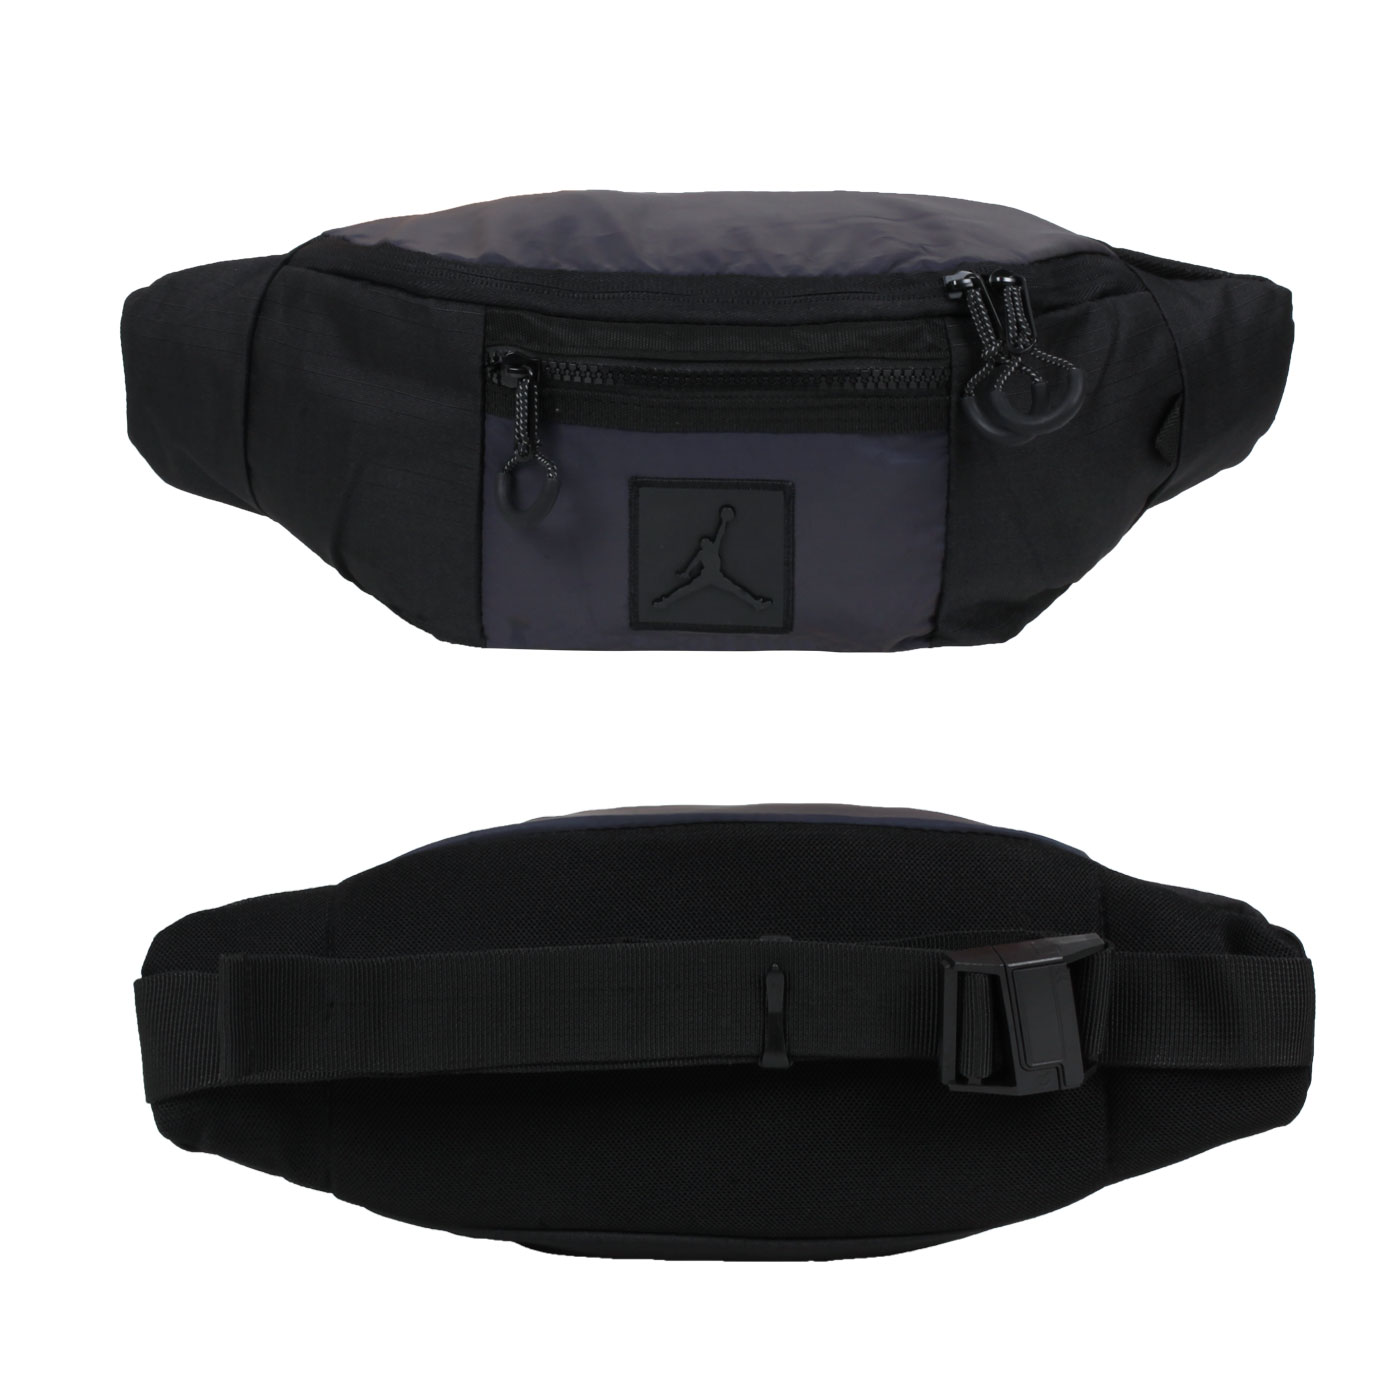 NIKE JORDAN 中型腰包 JD2143012GS-001 - 黑紫綠